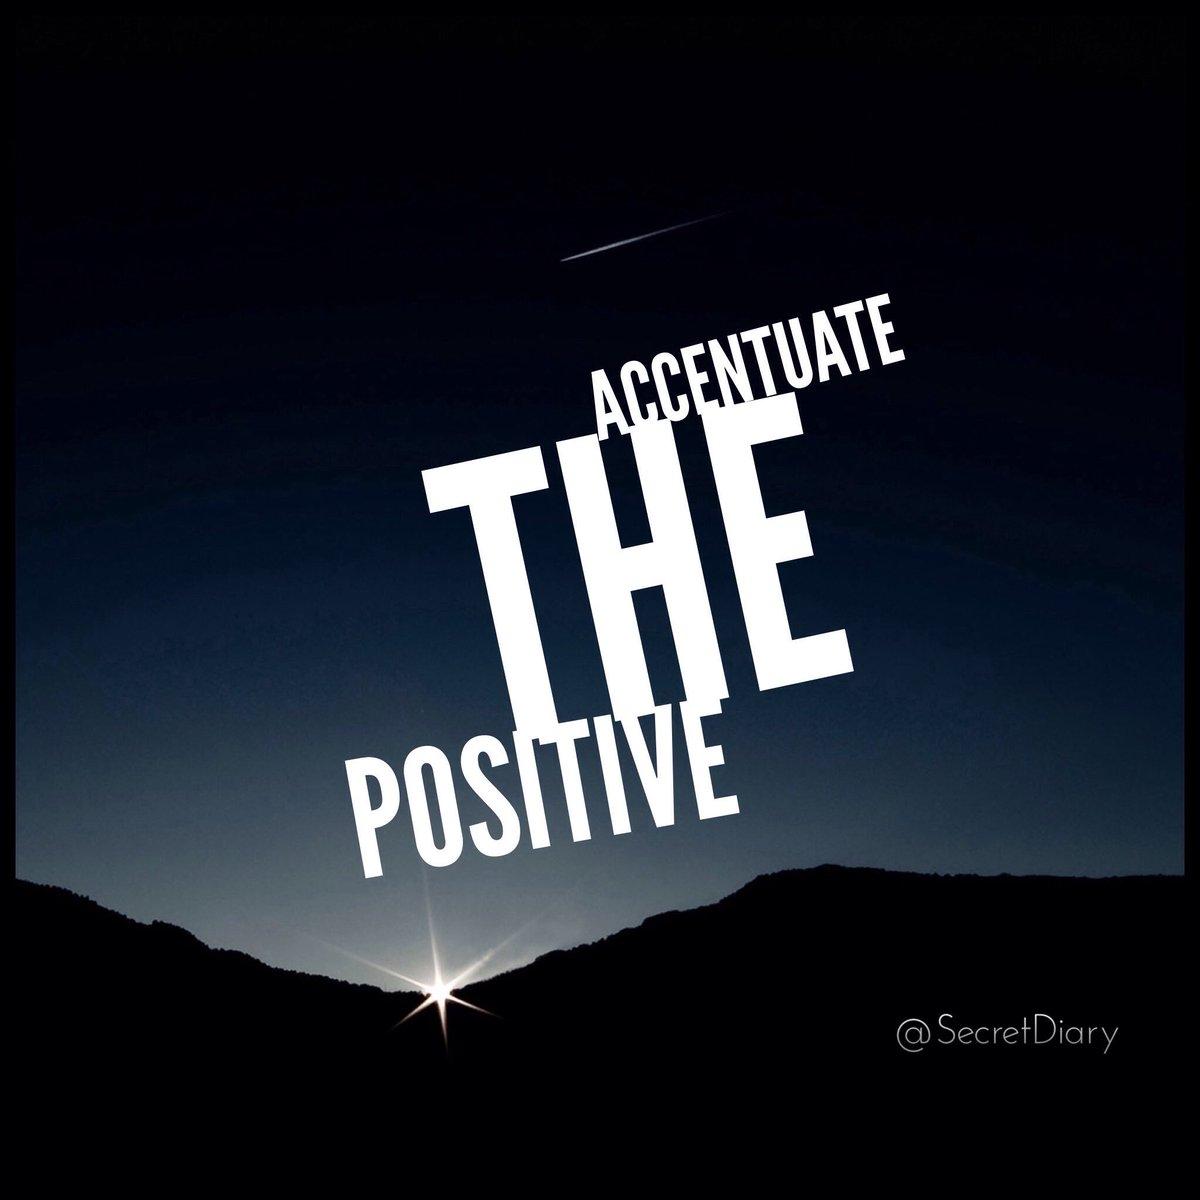 Accentuate the positive. Limit the negative. https://t.co/ooh3eT4F9k